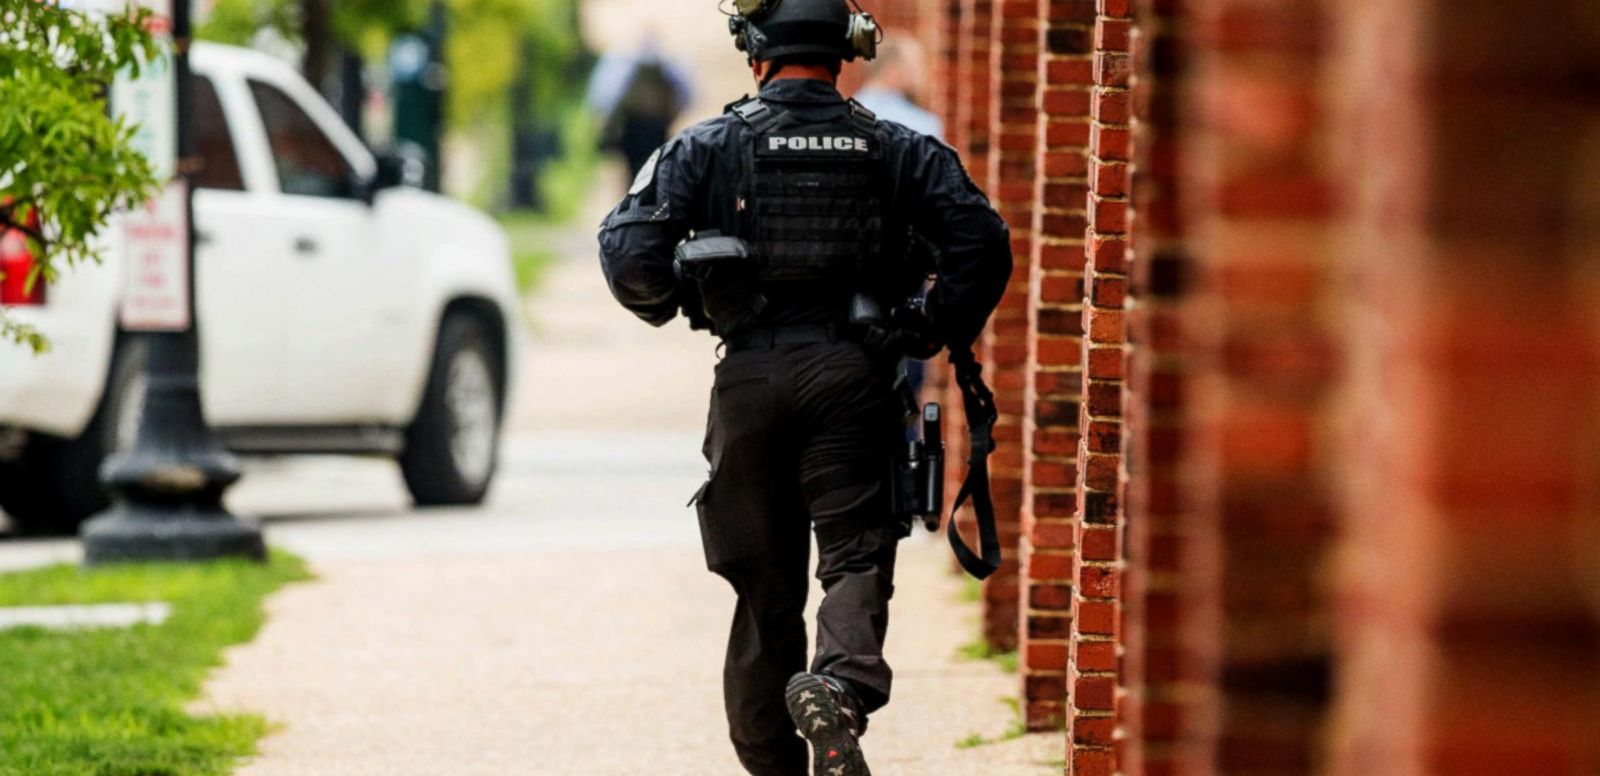 VIDEO: Police Respond to False Alarm at Washington Navy Yard